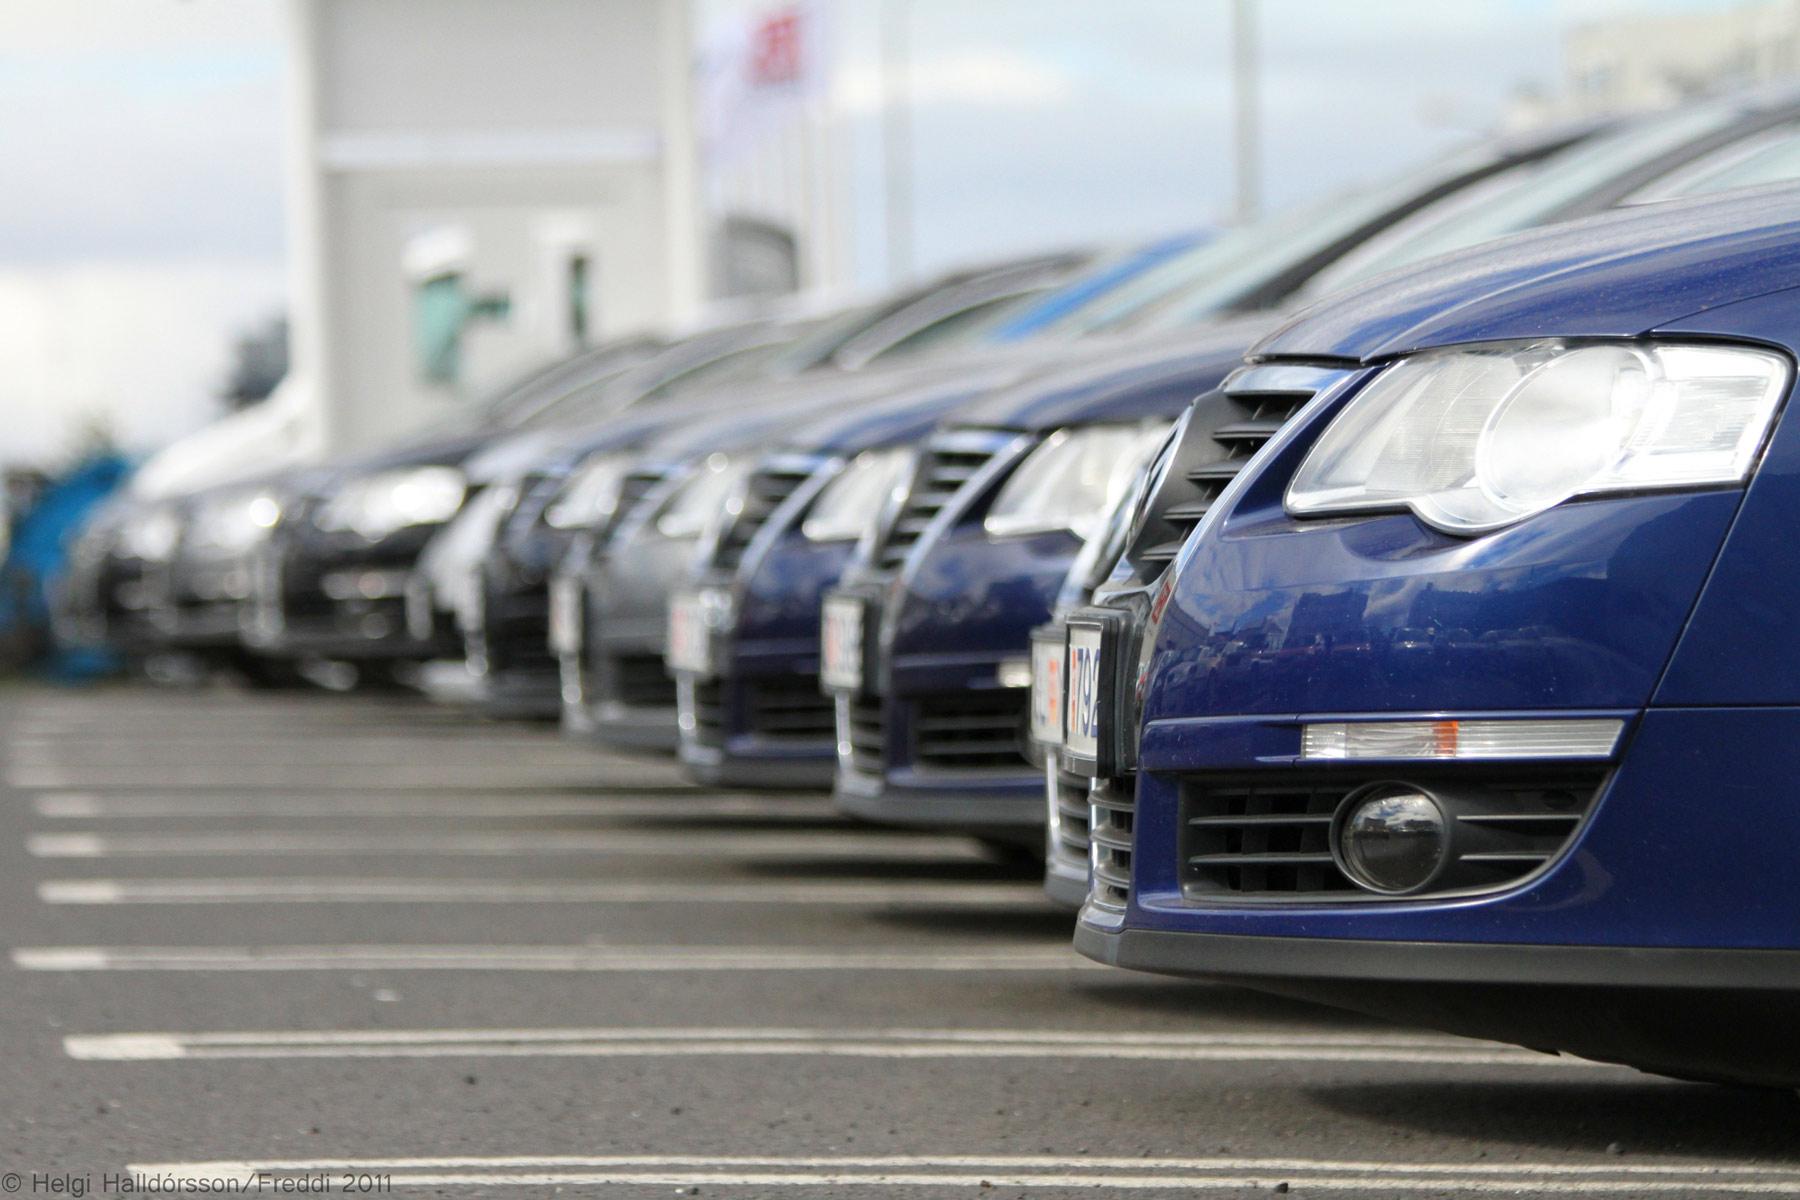 Cars_for_sale_(6046441241).jpg